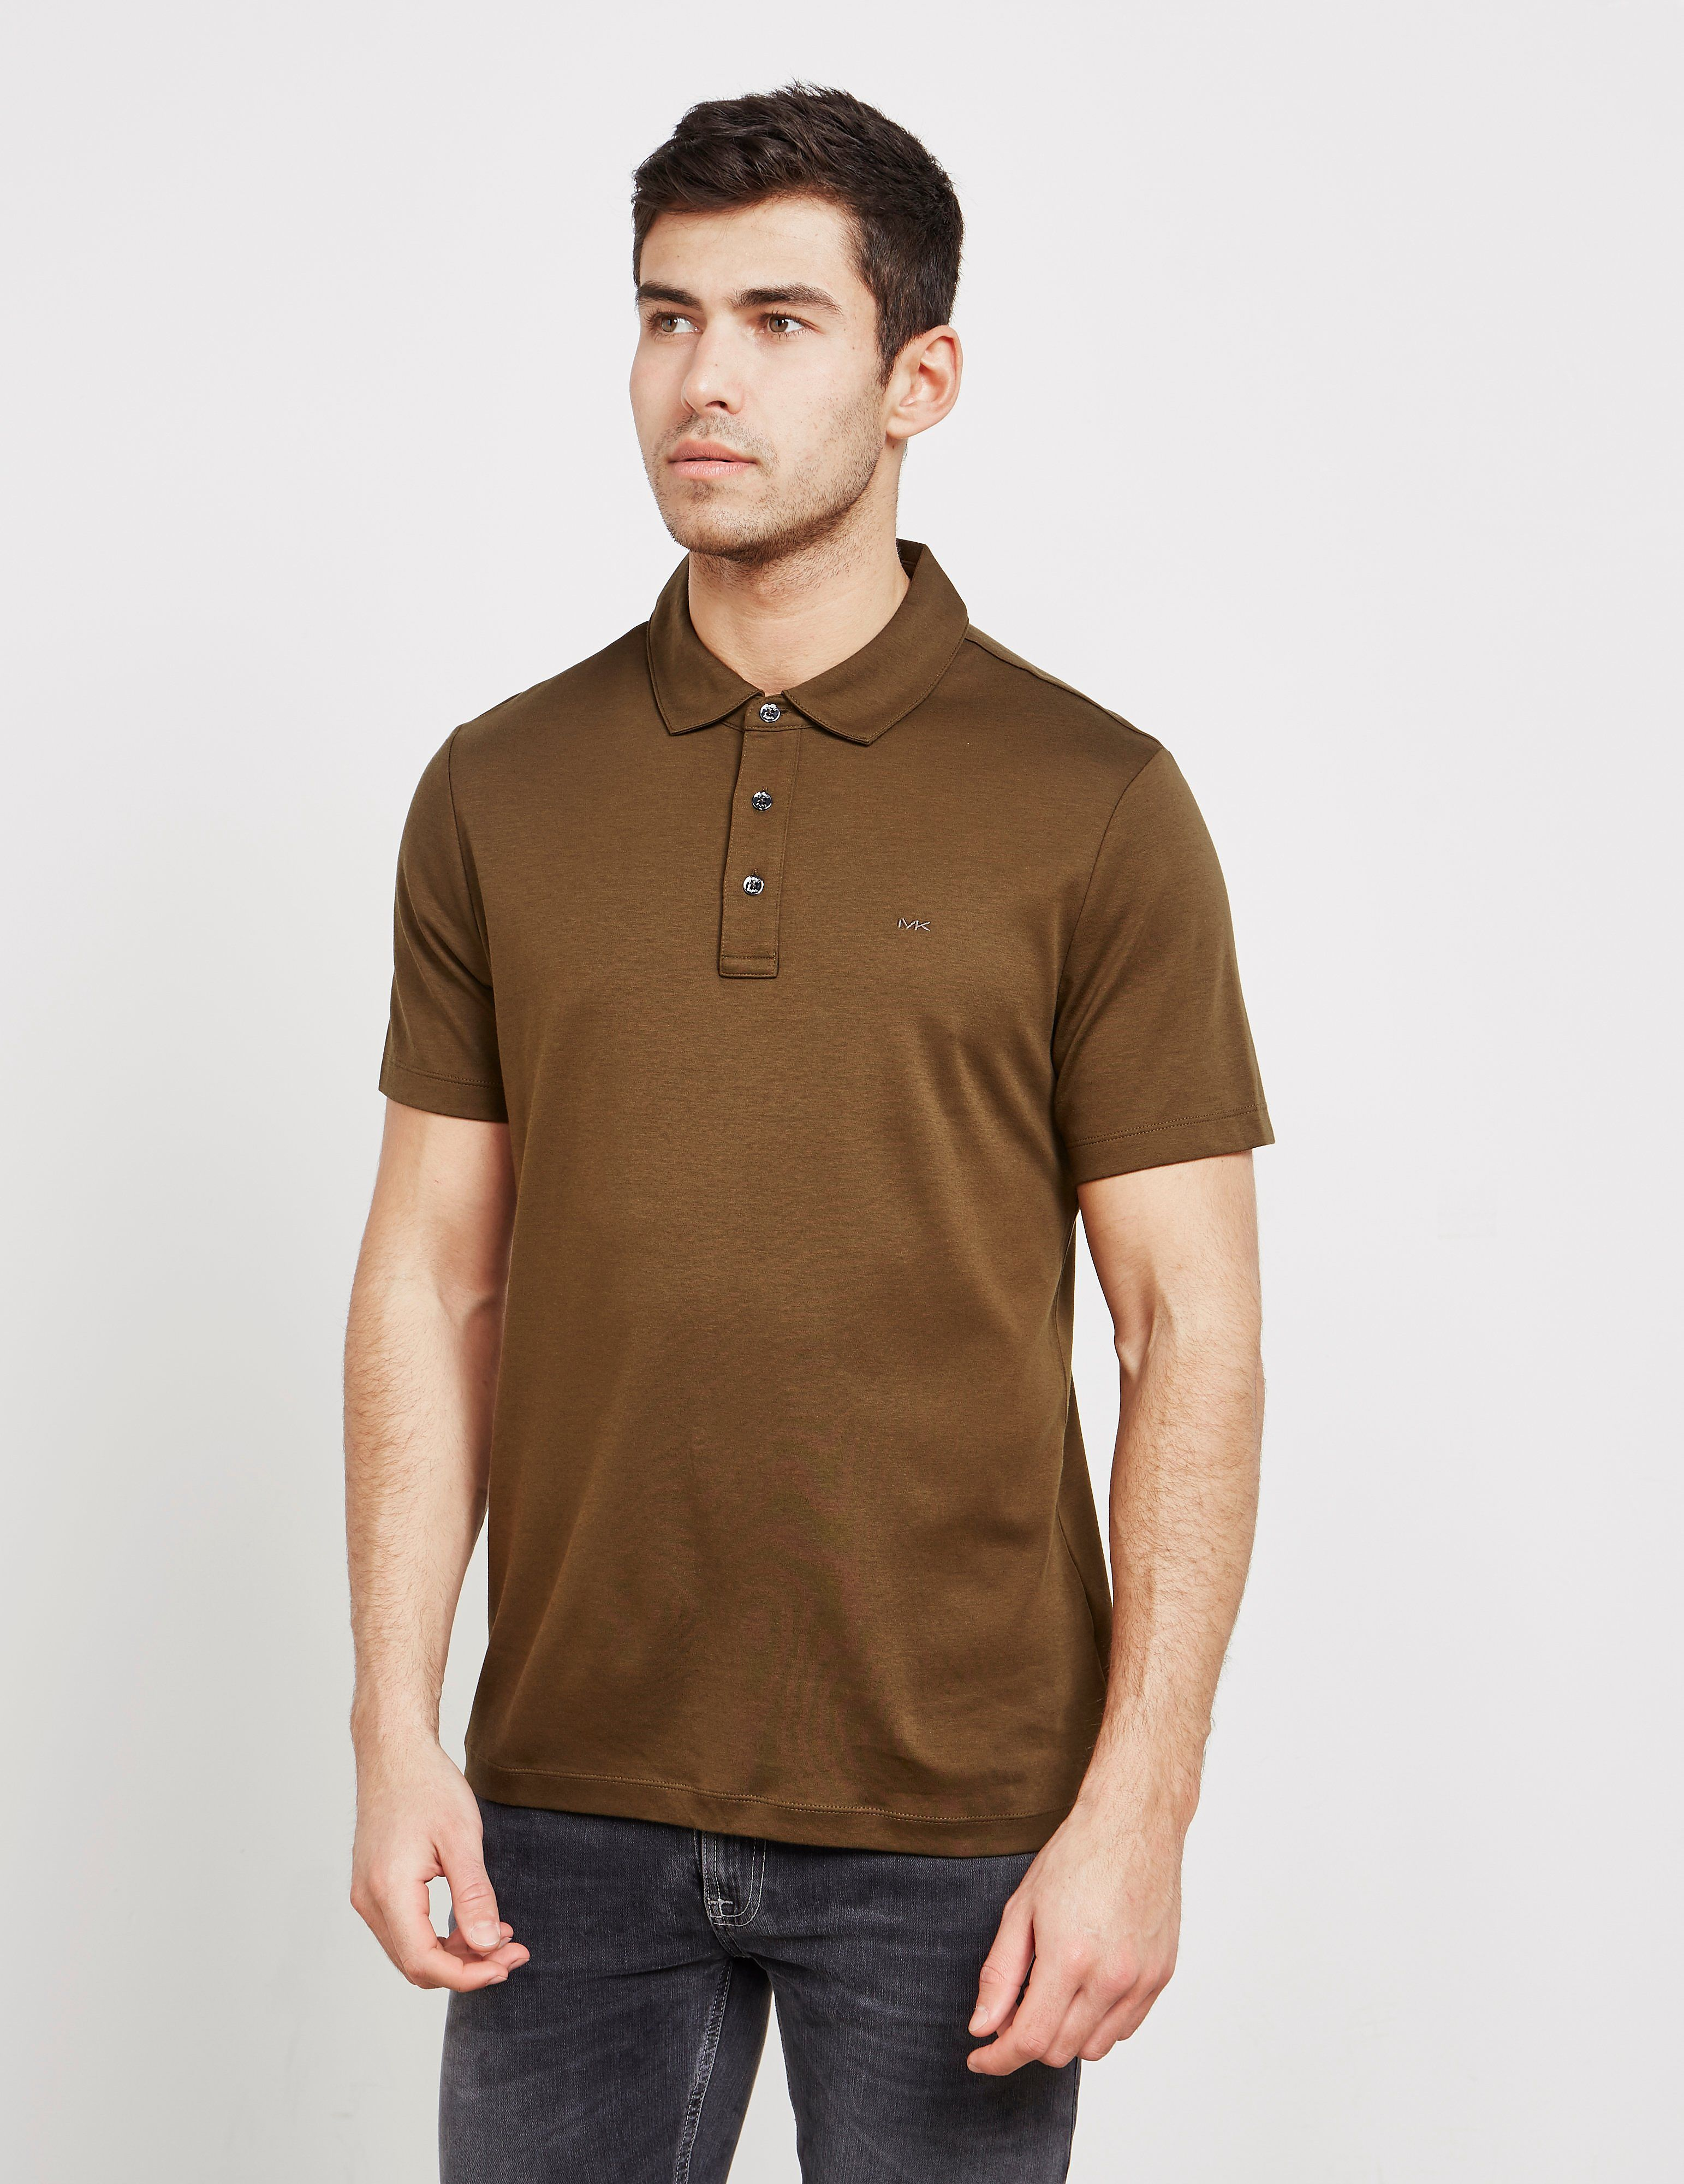 ffb1b168 Michael Kors Sleek Short Sleeve Polo Shirt   Tessuti